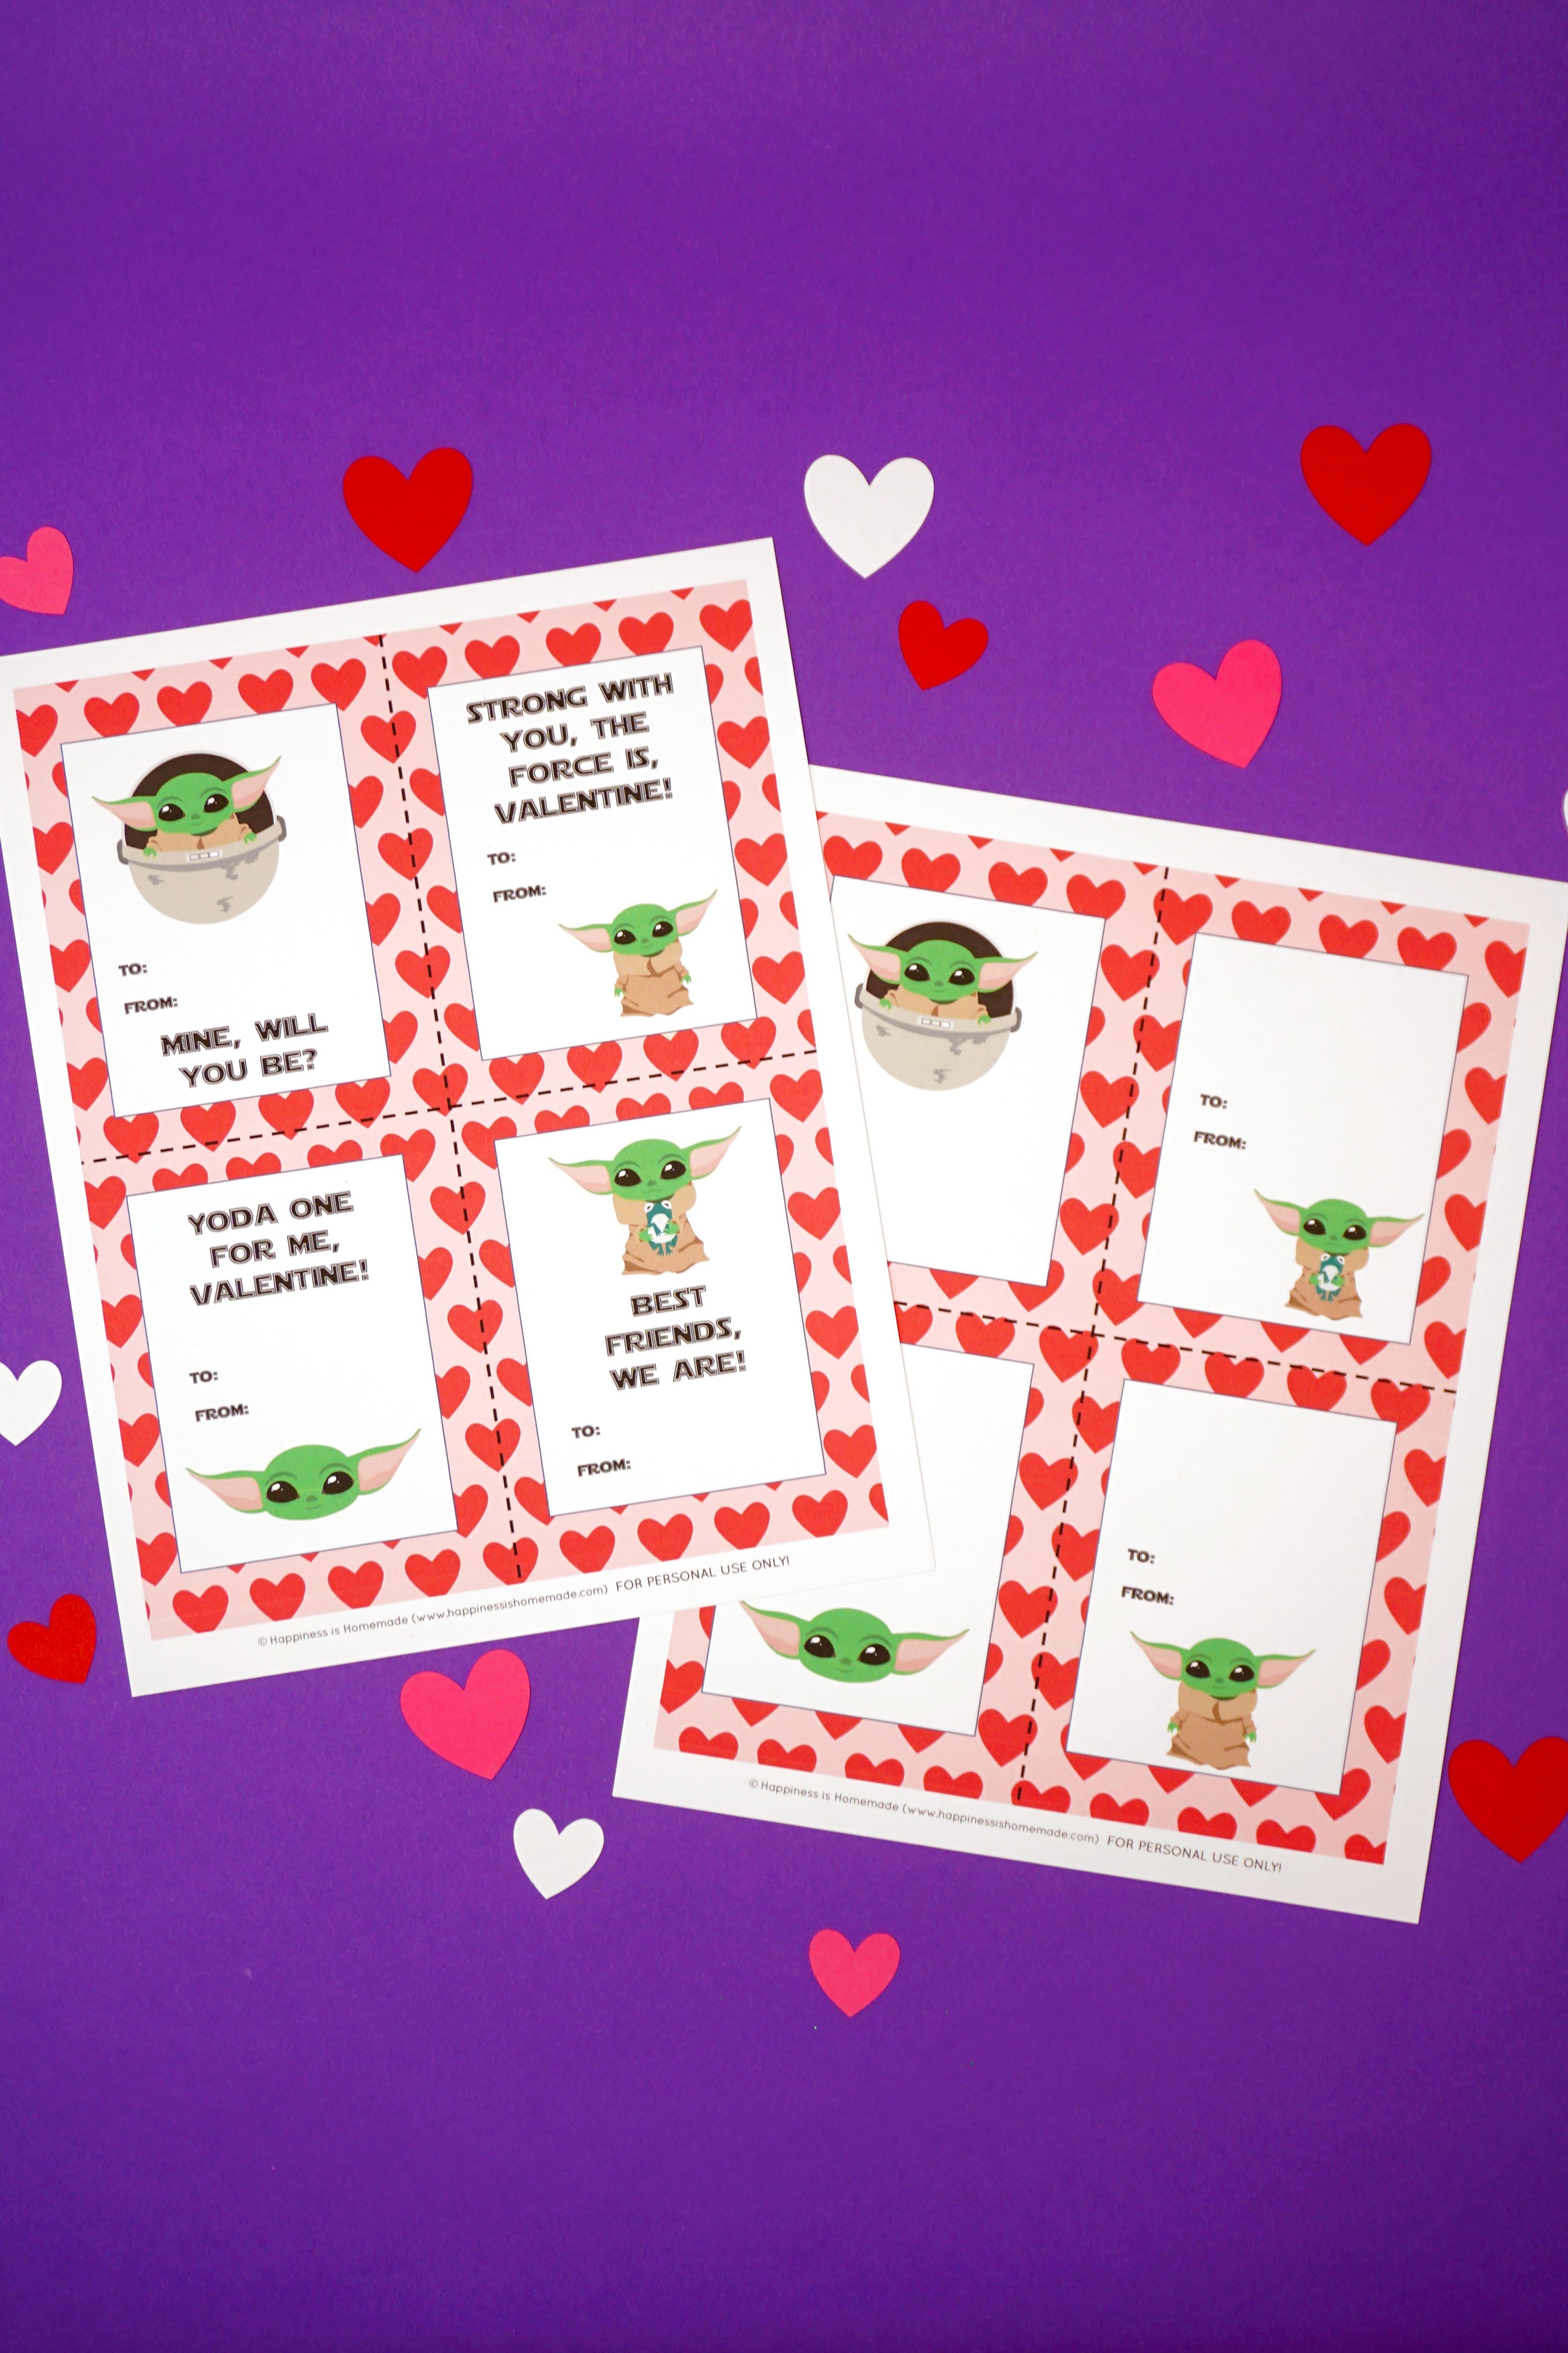 Baby Yoda Valentines Cards